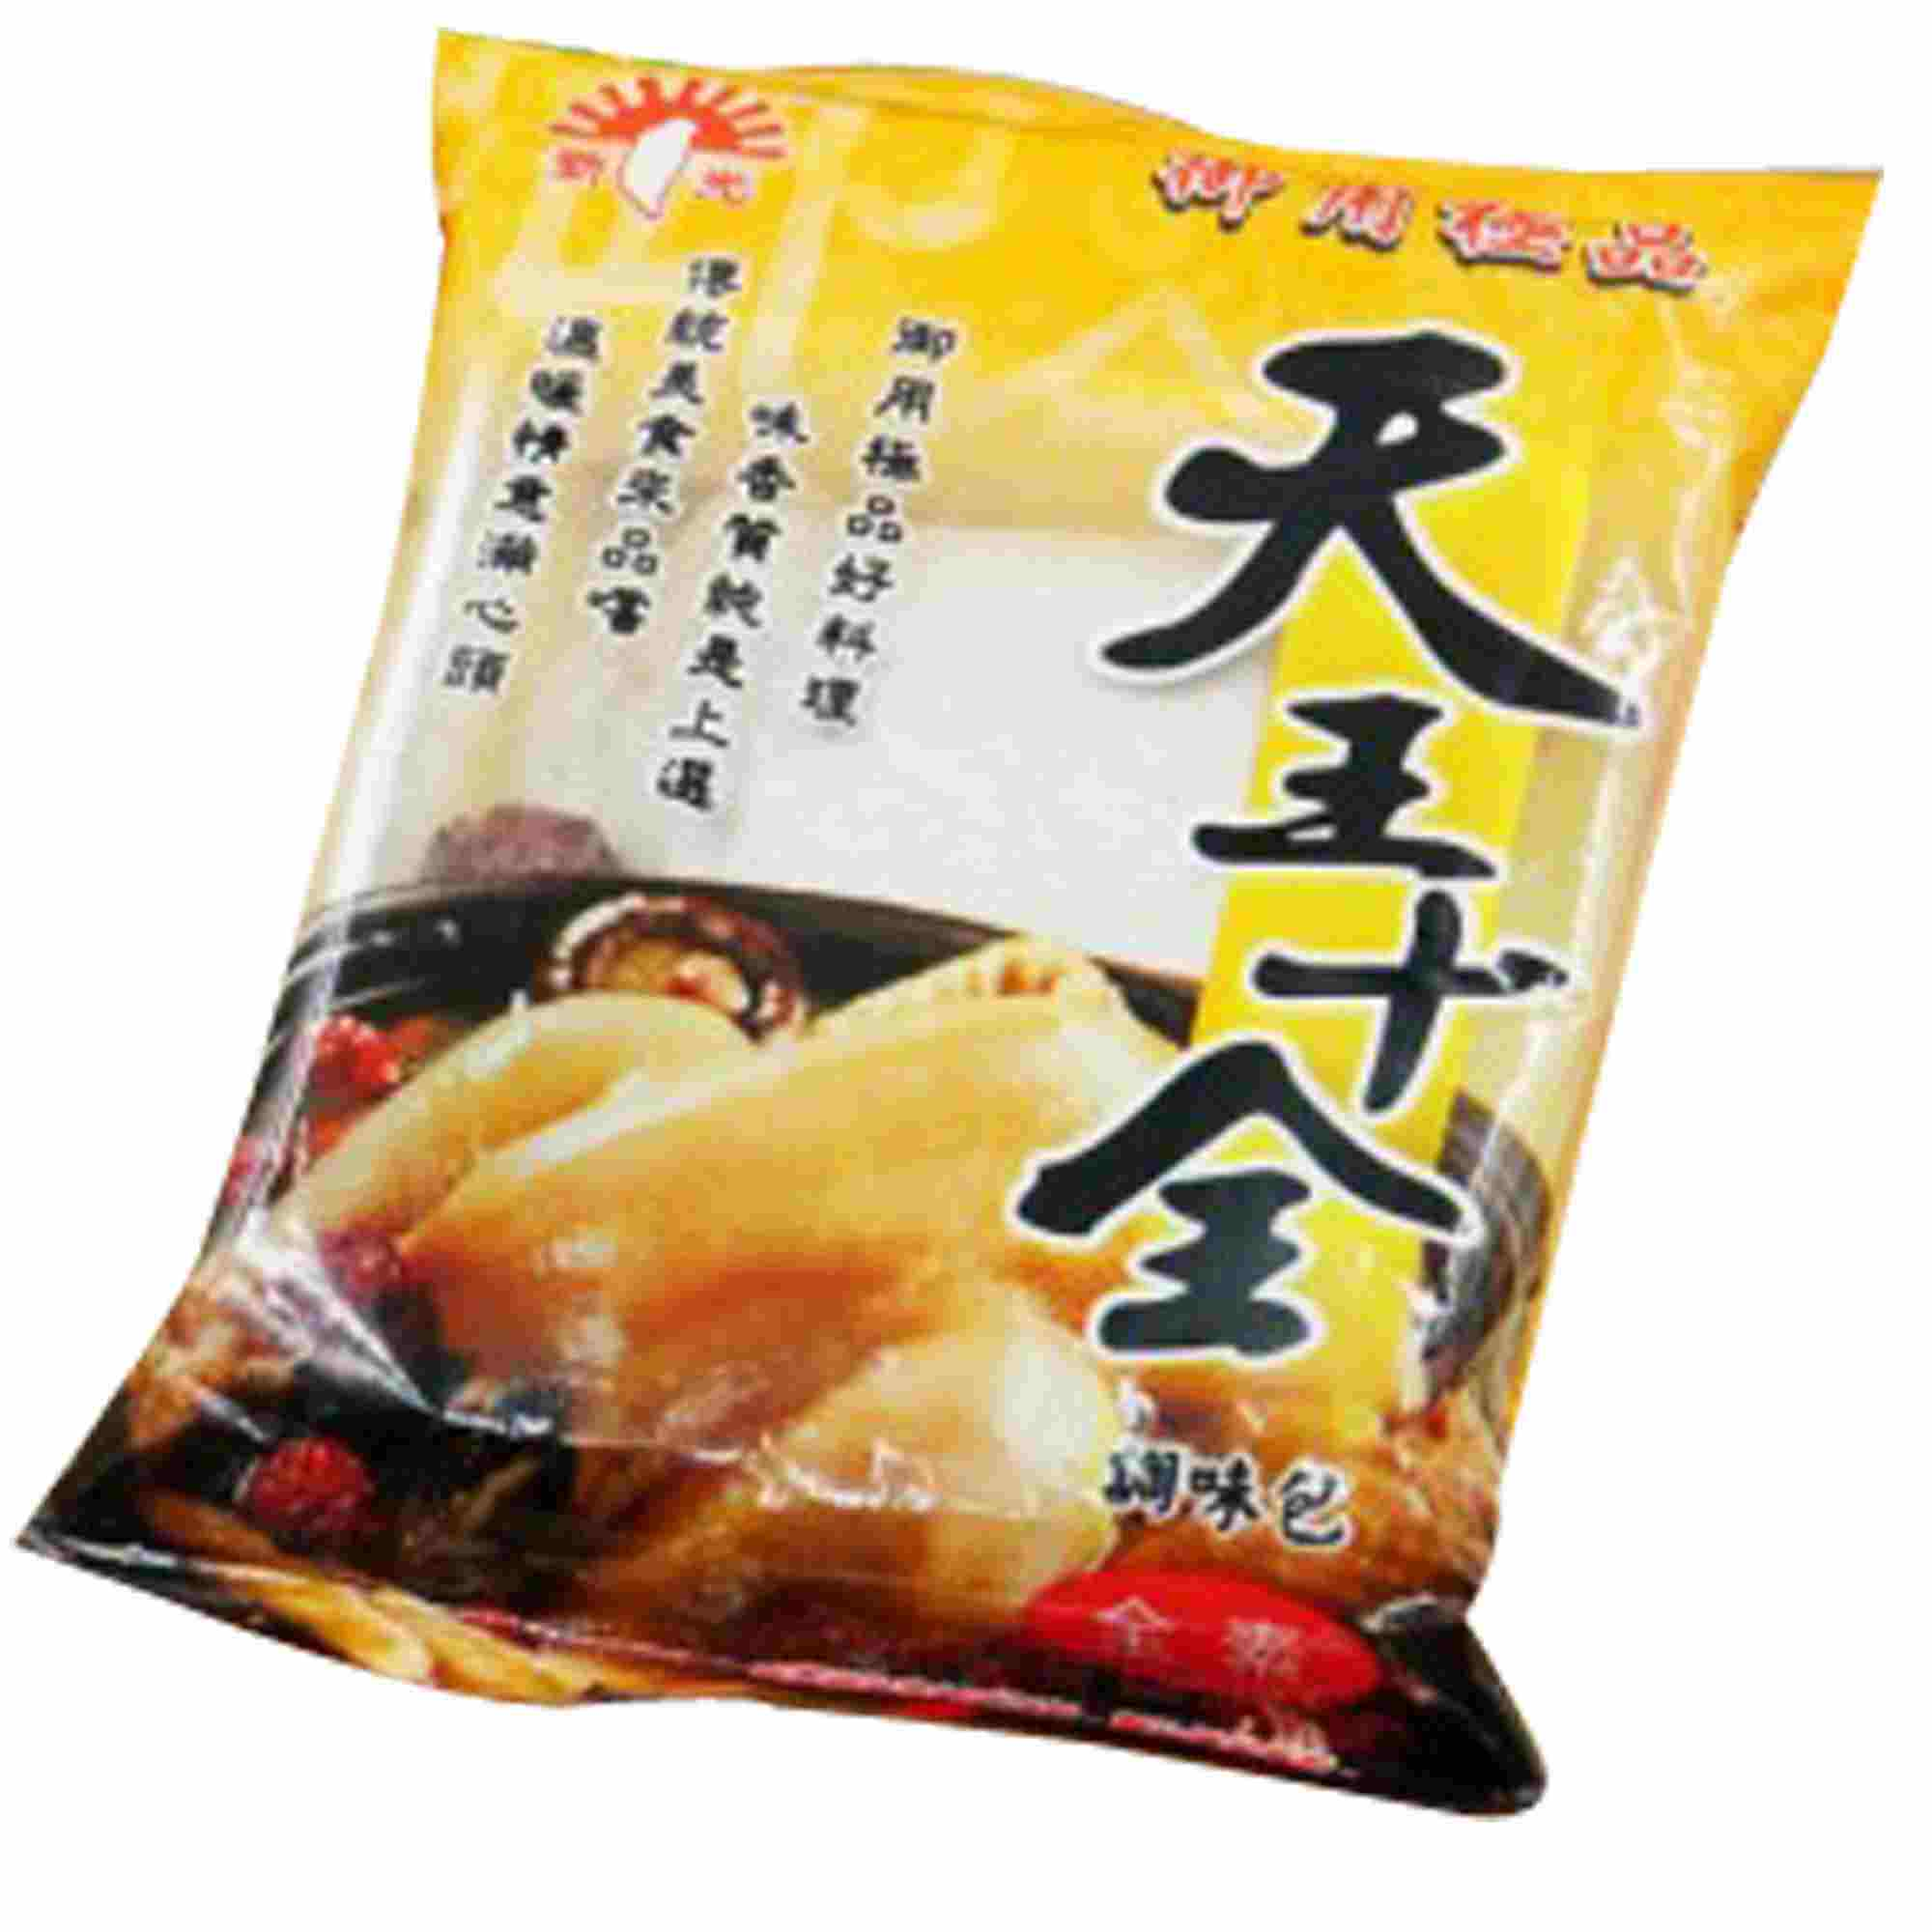 Image hsin kuang Herbal Heavenly Kings perfect herbal soup Tian Wang Shi Quan 新光 - 天王十全 60grams